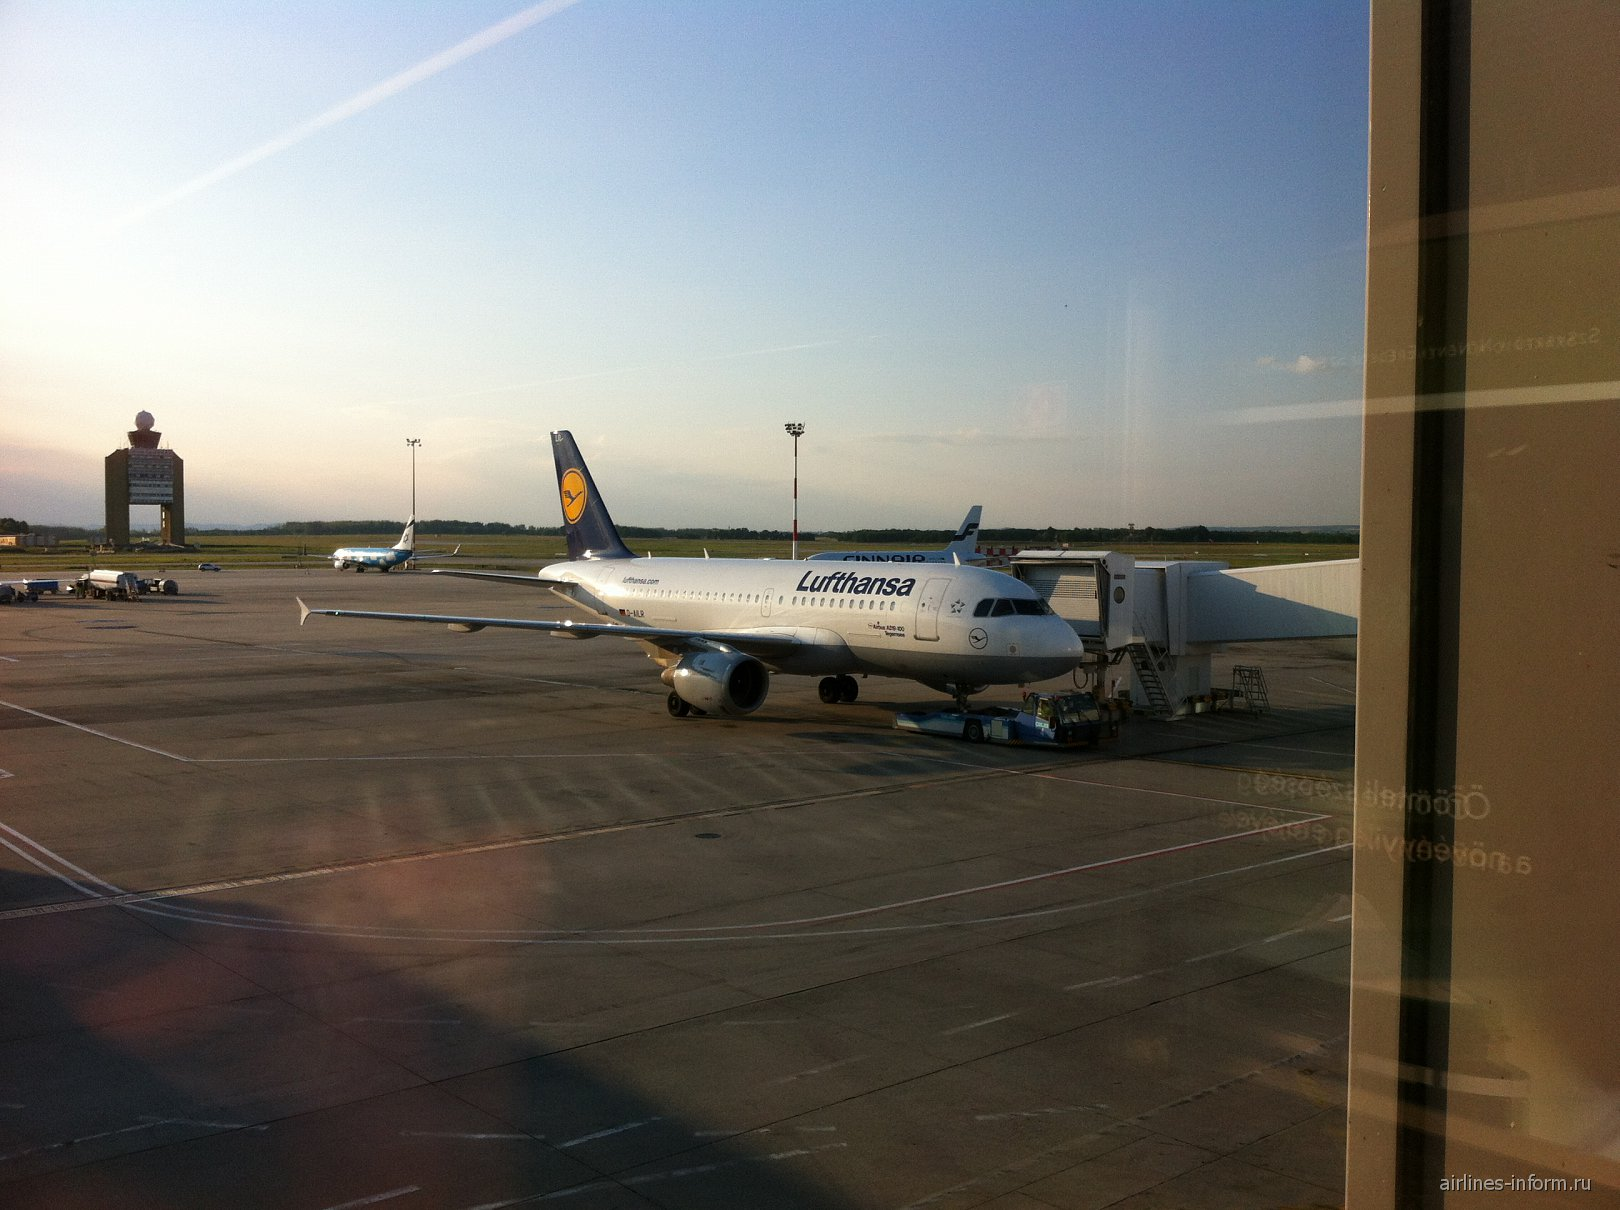 A319 Lufthansa